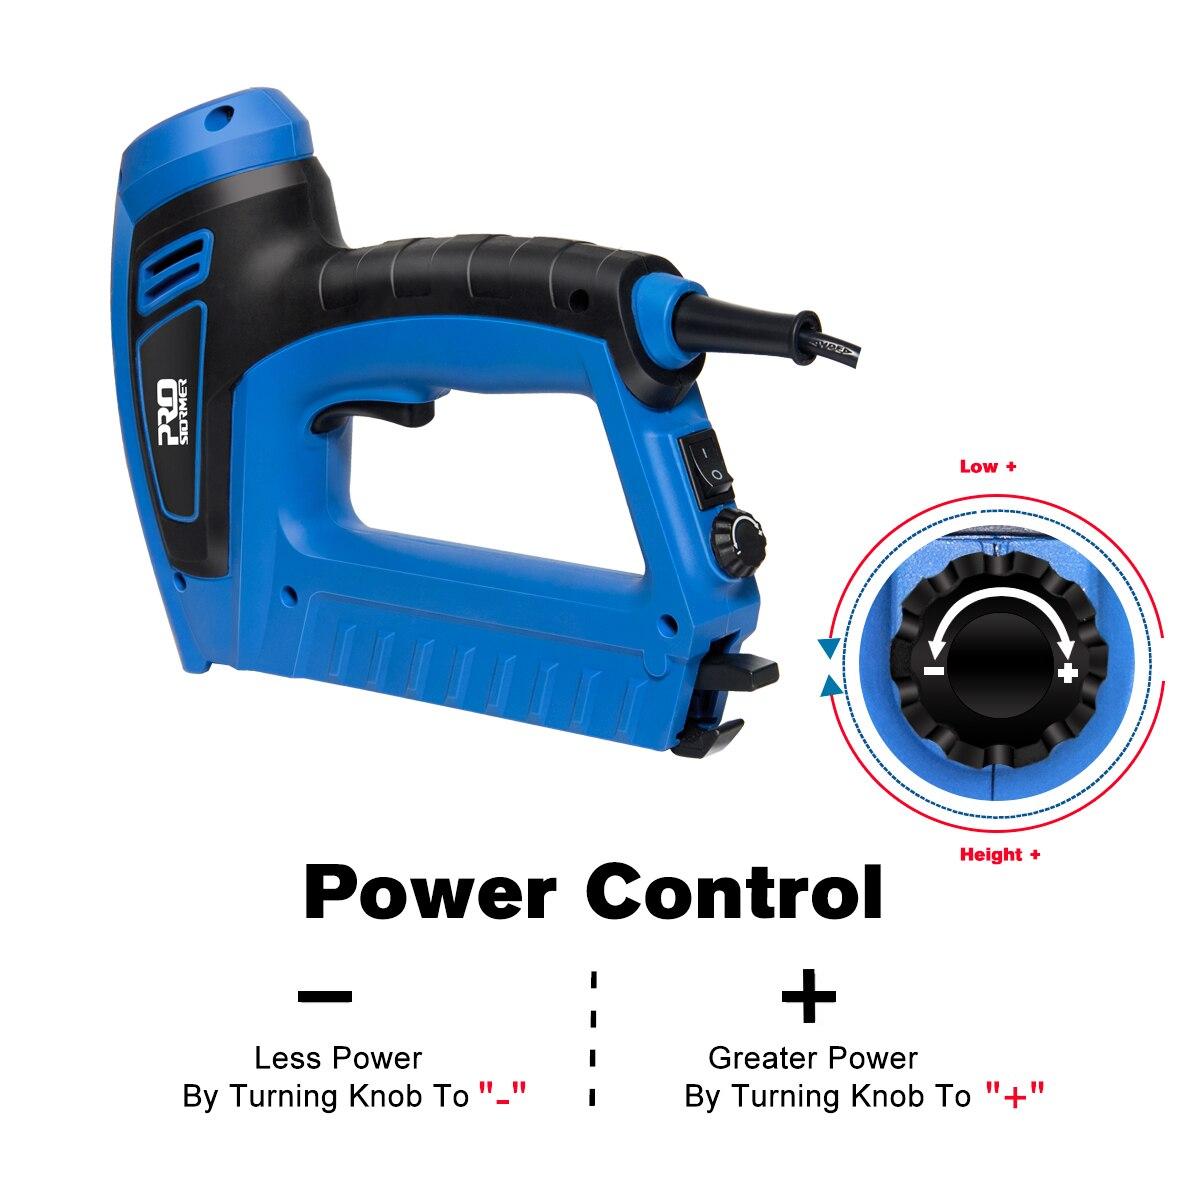 Tools : 2000W Electric Nail Gun 220V-240V Nailer Stapler Woodworking Electric Tacker Furniture Staple Gun Power Tools by PROSTORMER